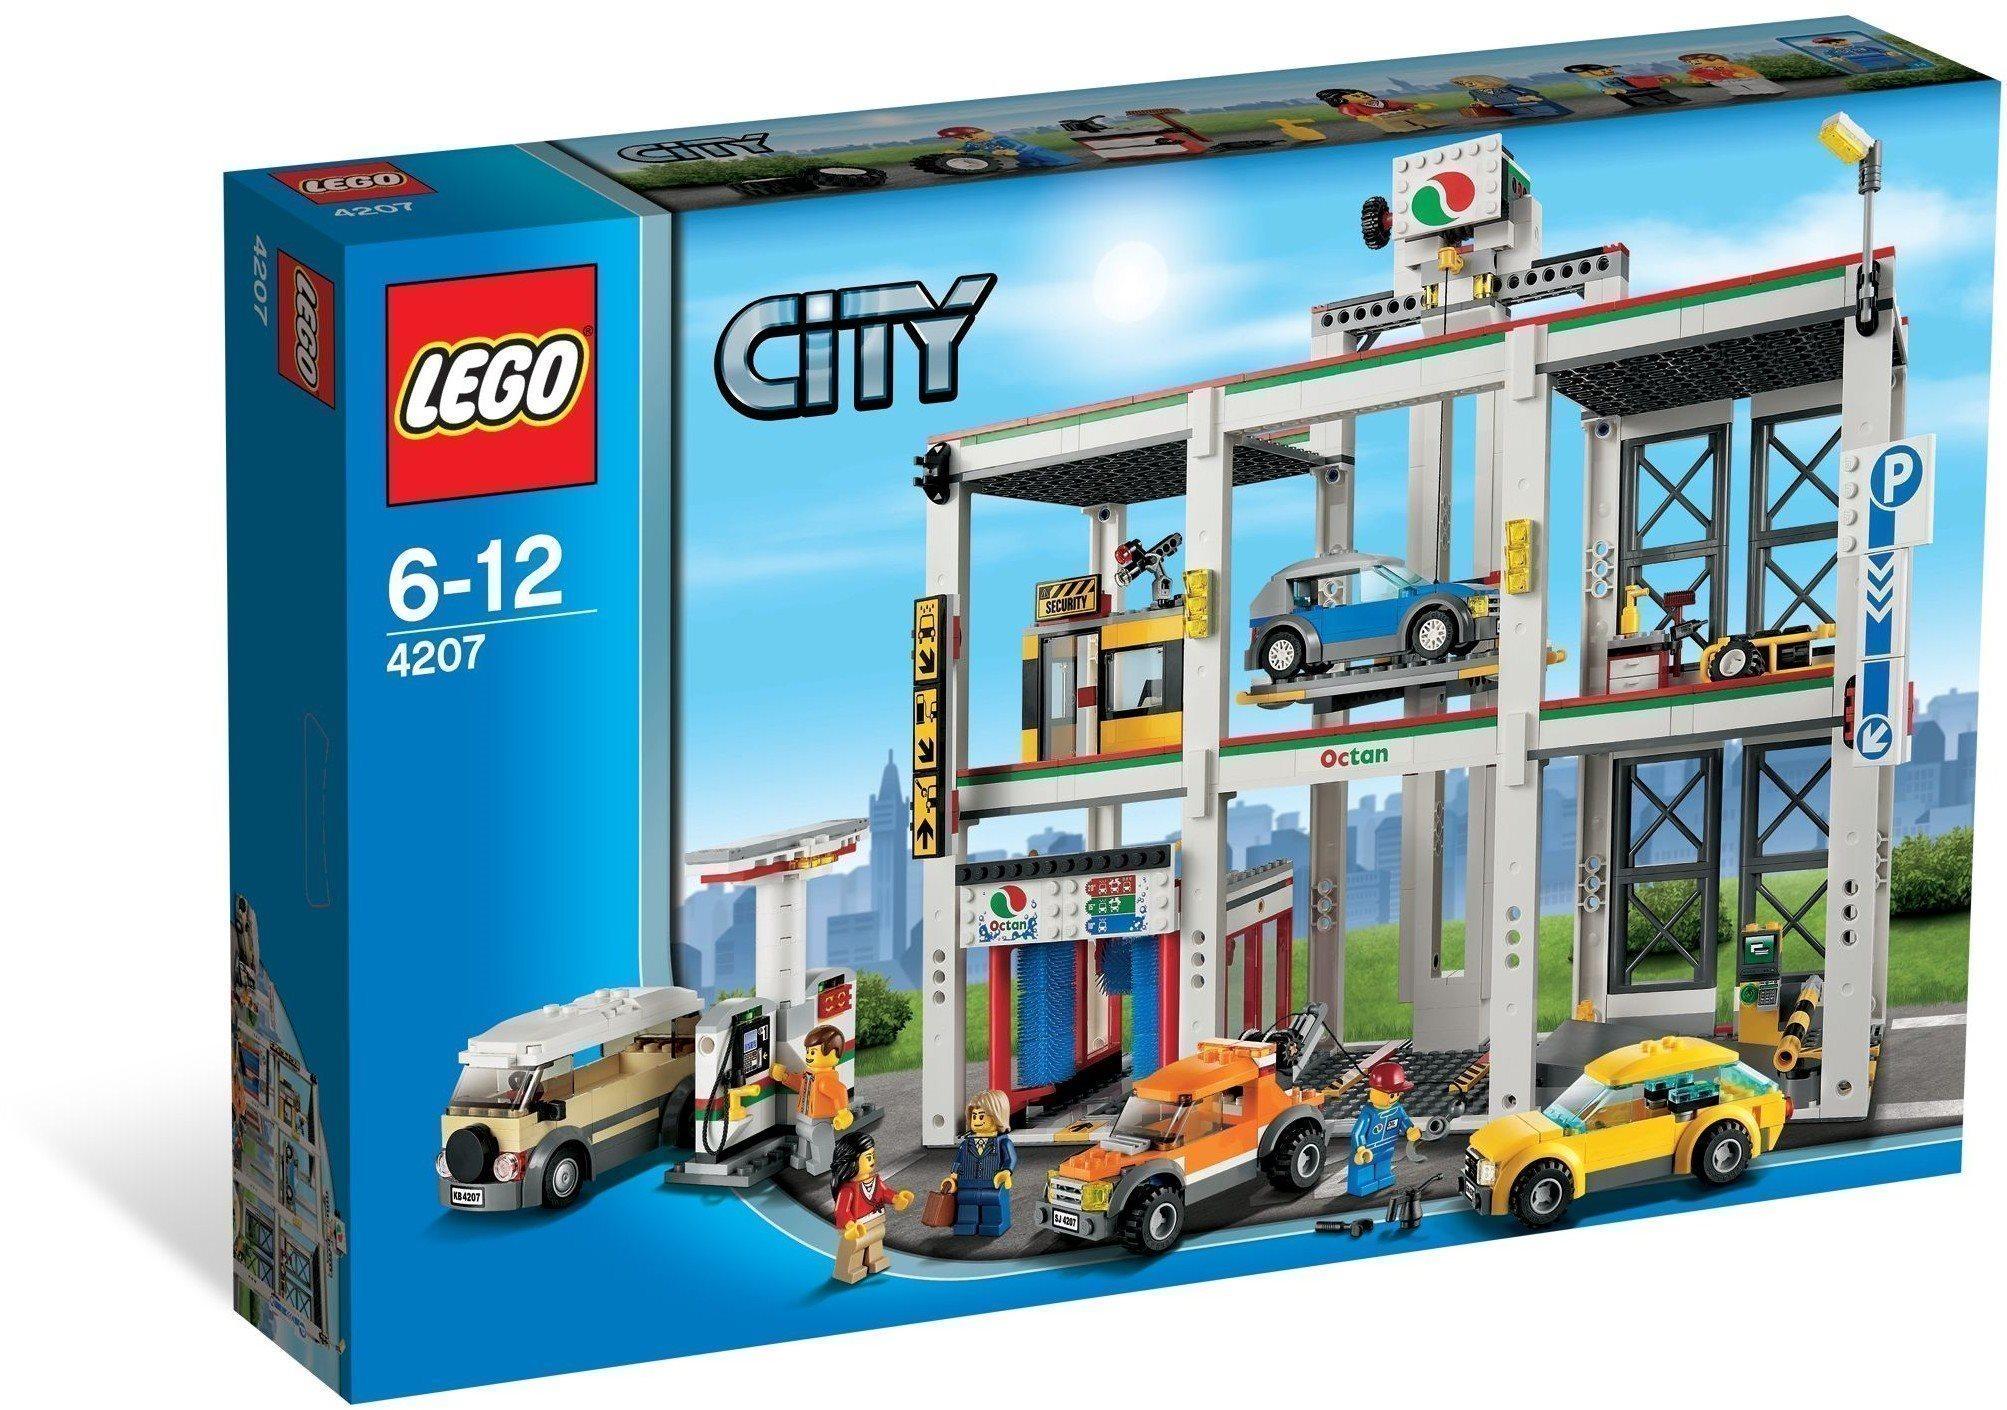 e63dc5e036af LEGO City 4207 City Garage, raritet från 2012 h.. (356175513) ᐈ Köp ...